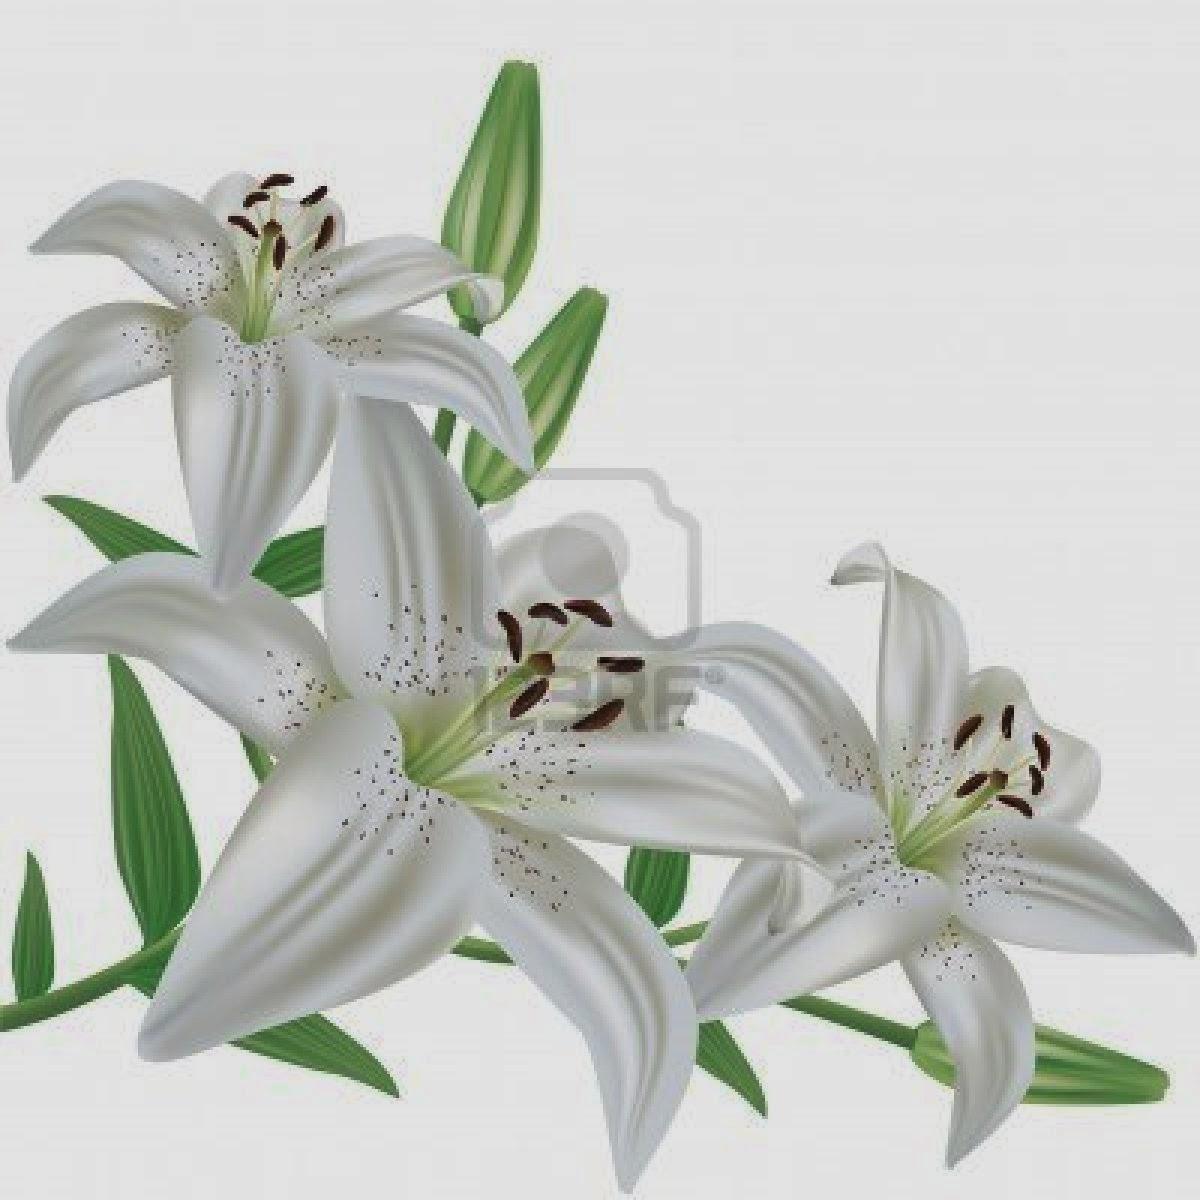 White Lily Flower Bouquethttprefreshrosespot